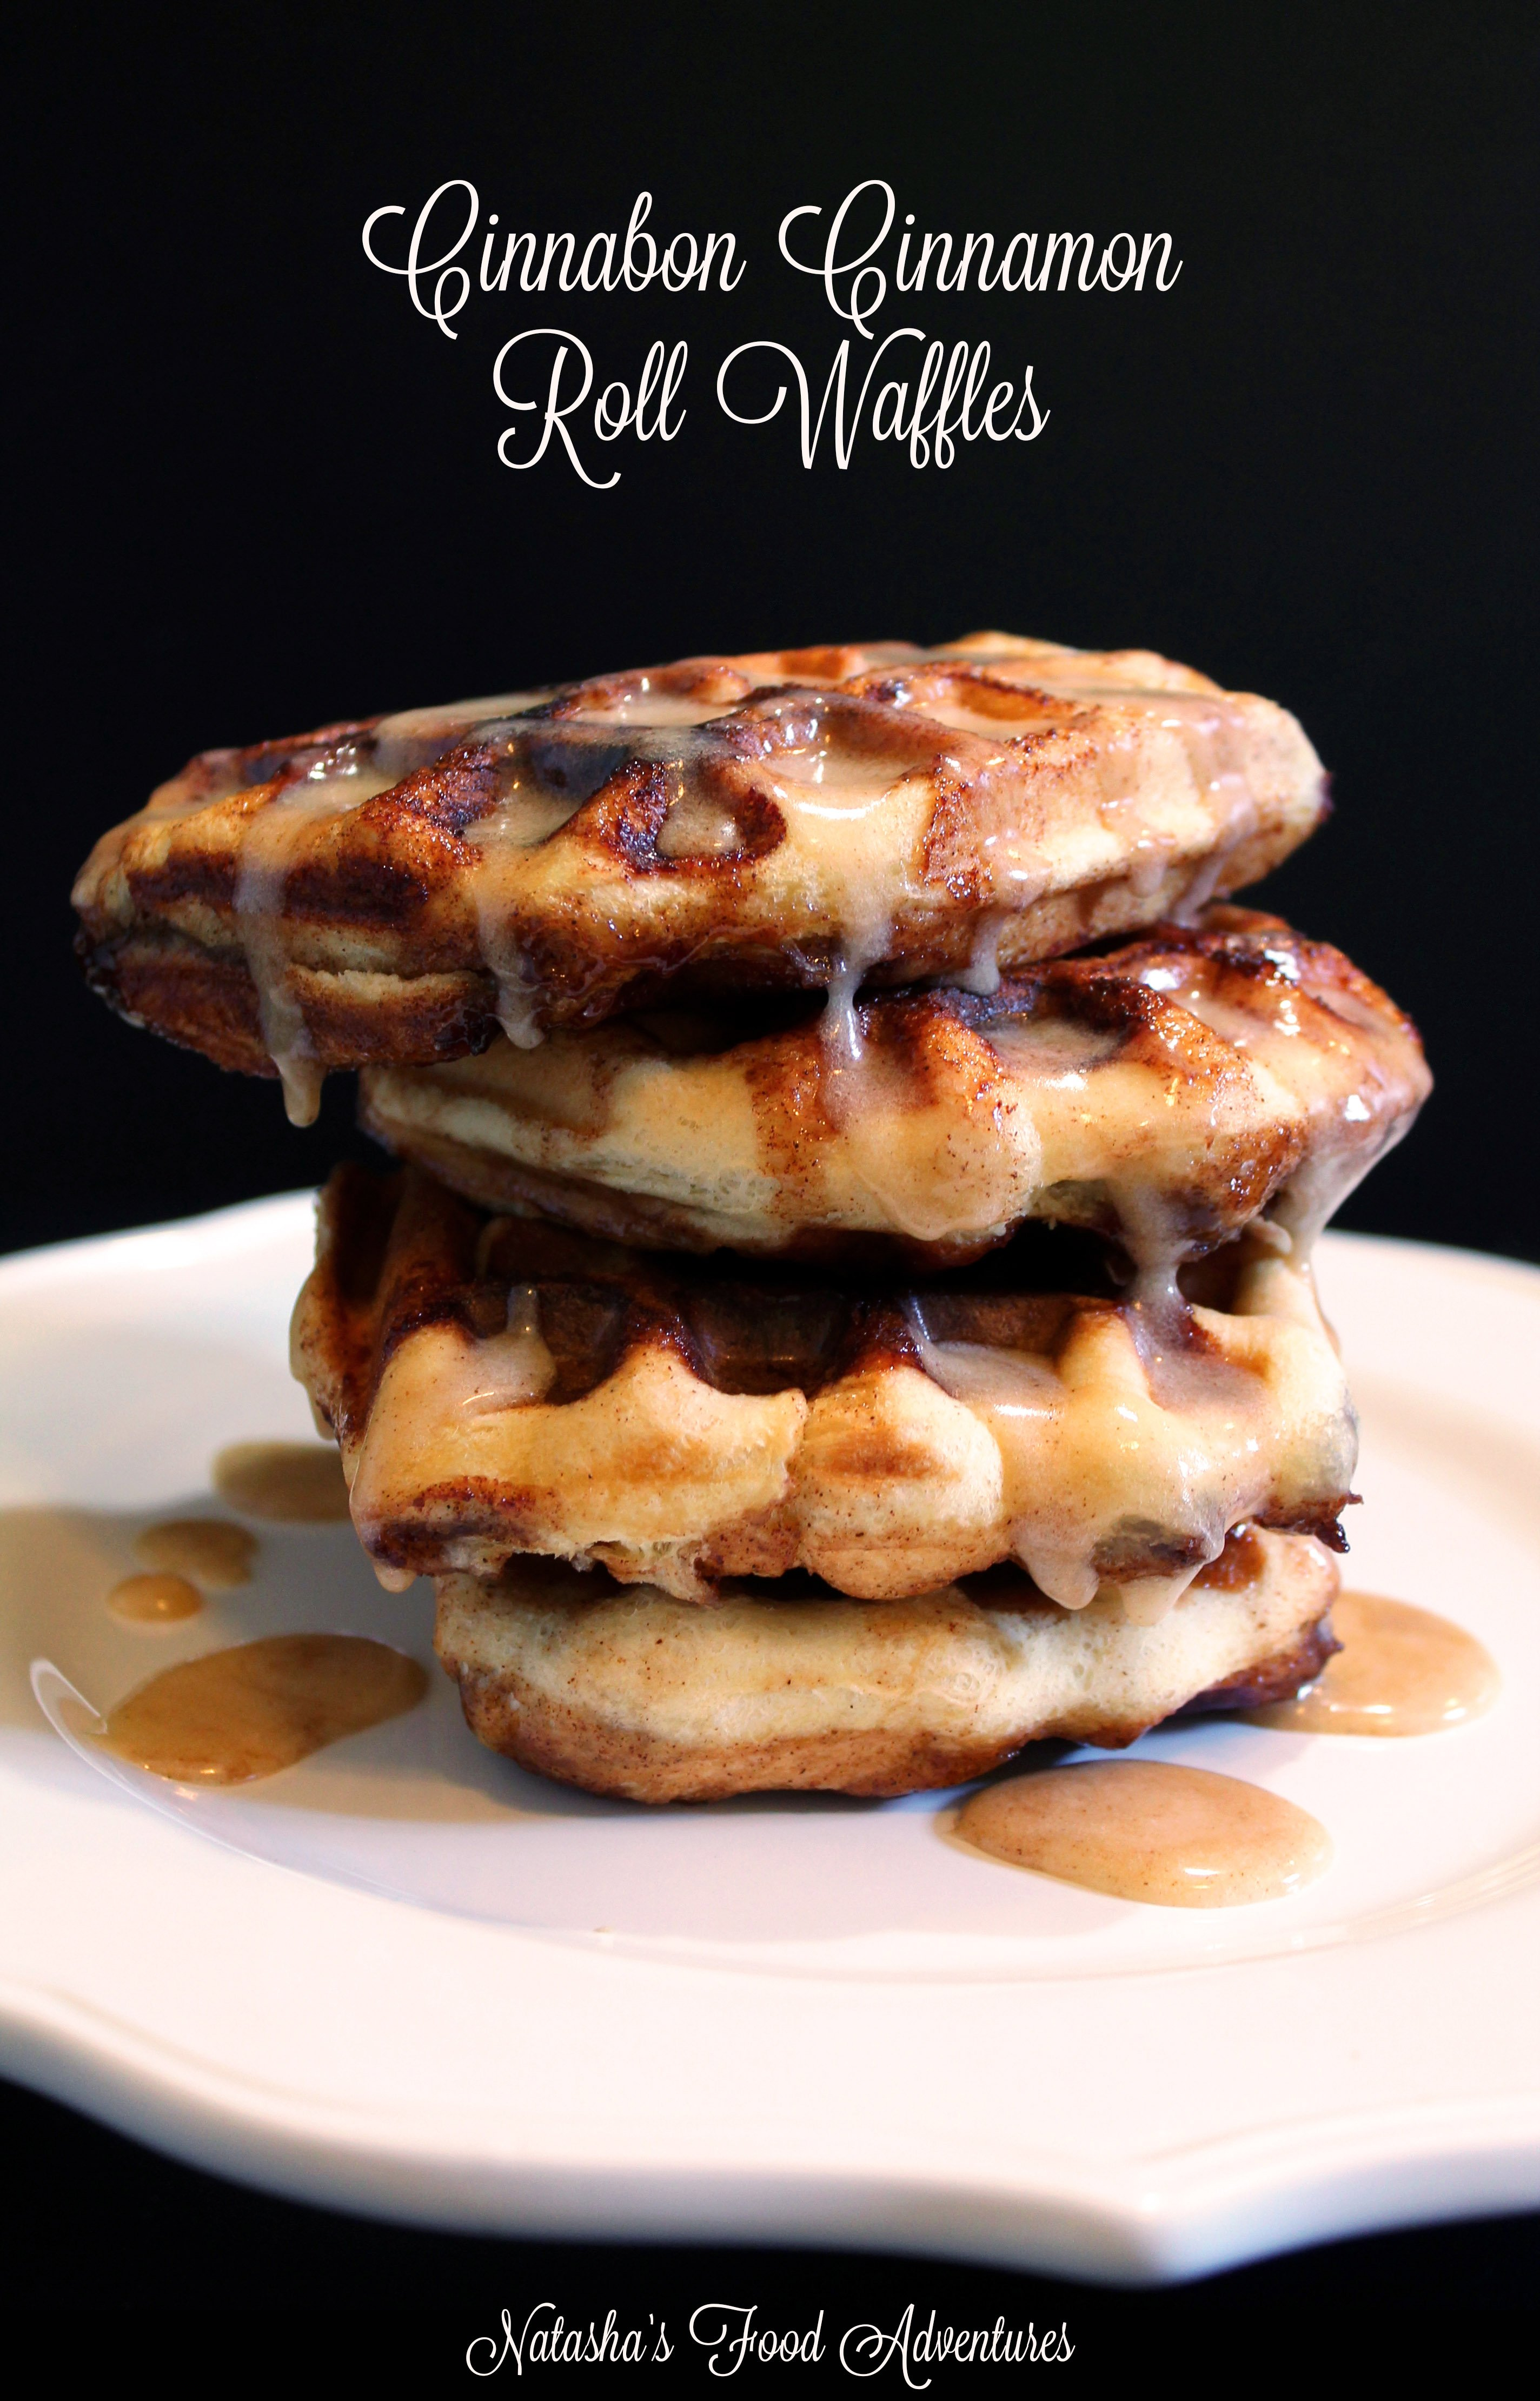 Cinnabon Cinnamon Roll Waffles